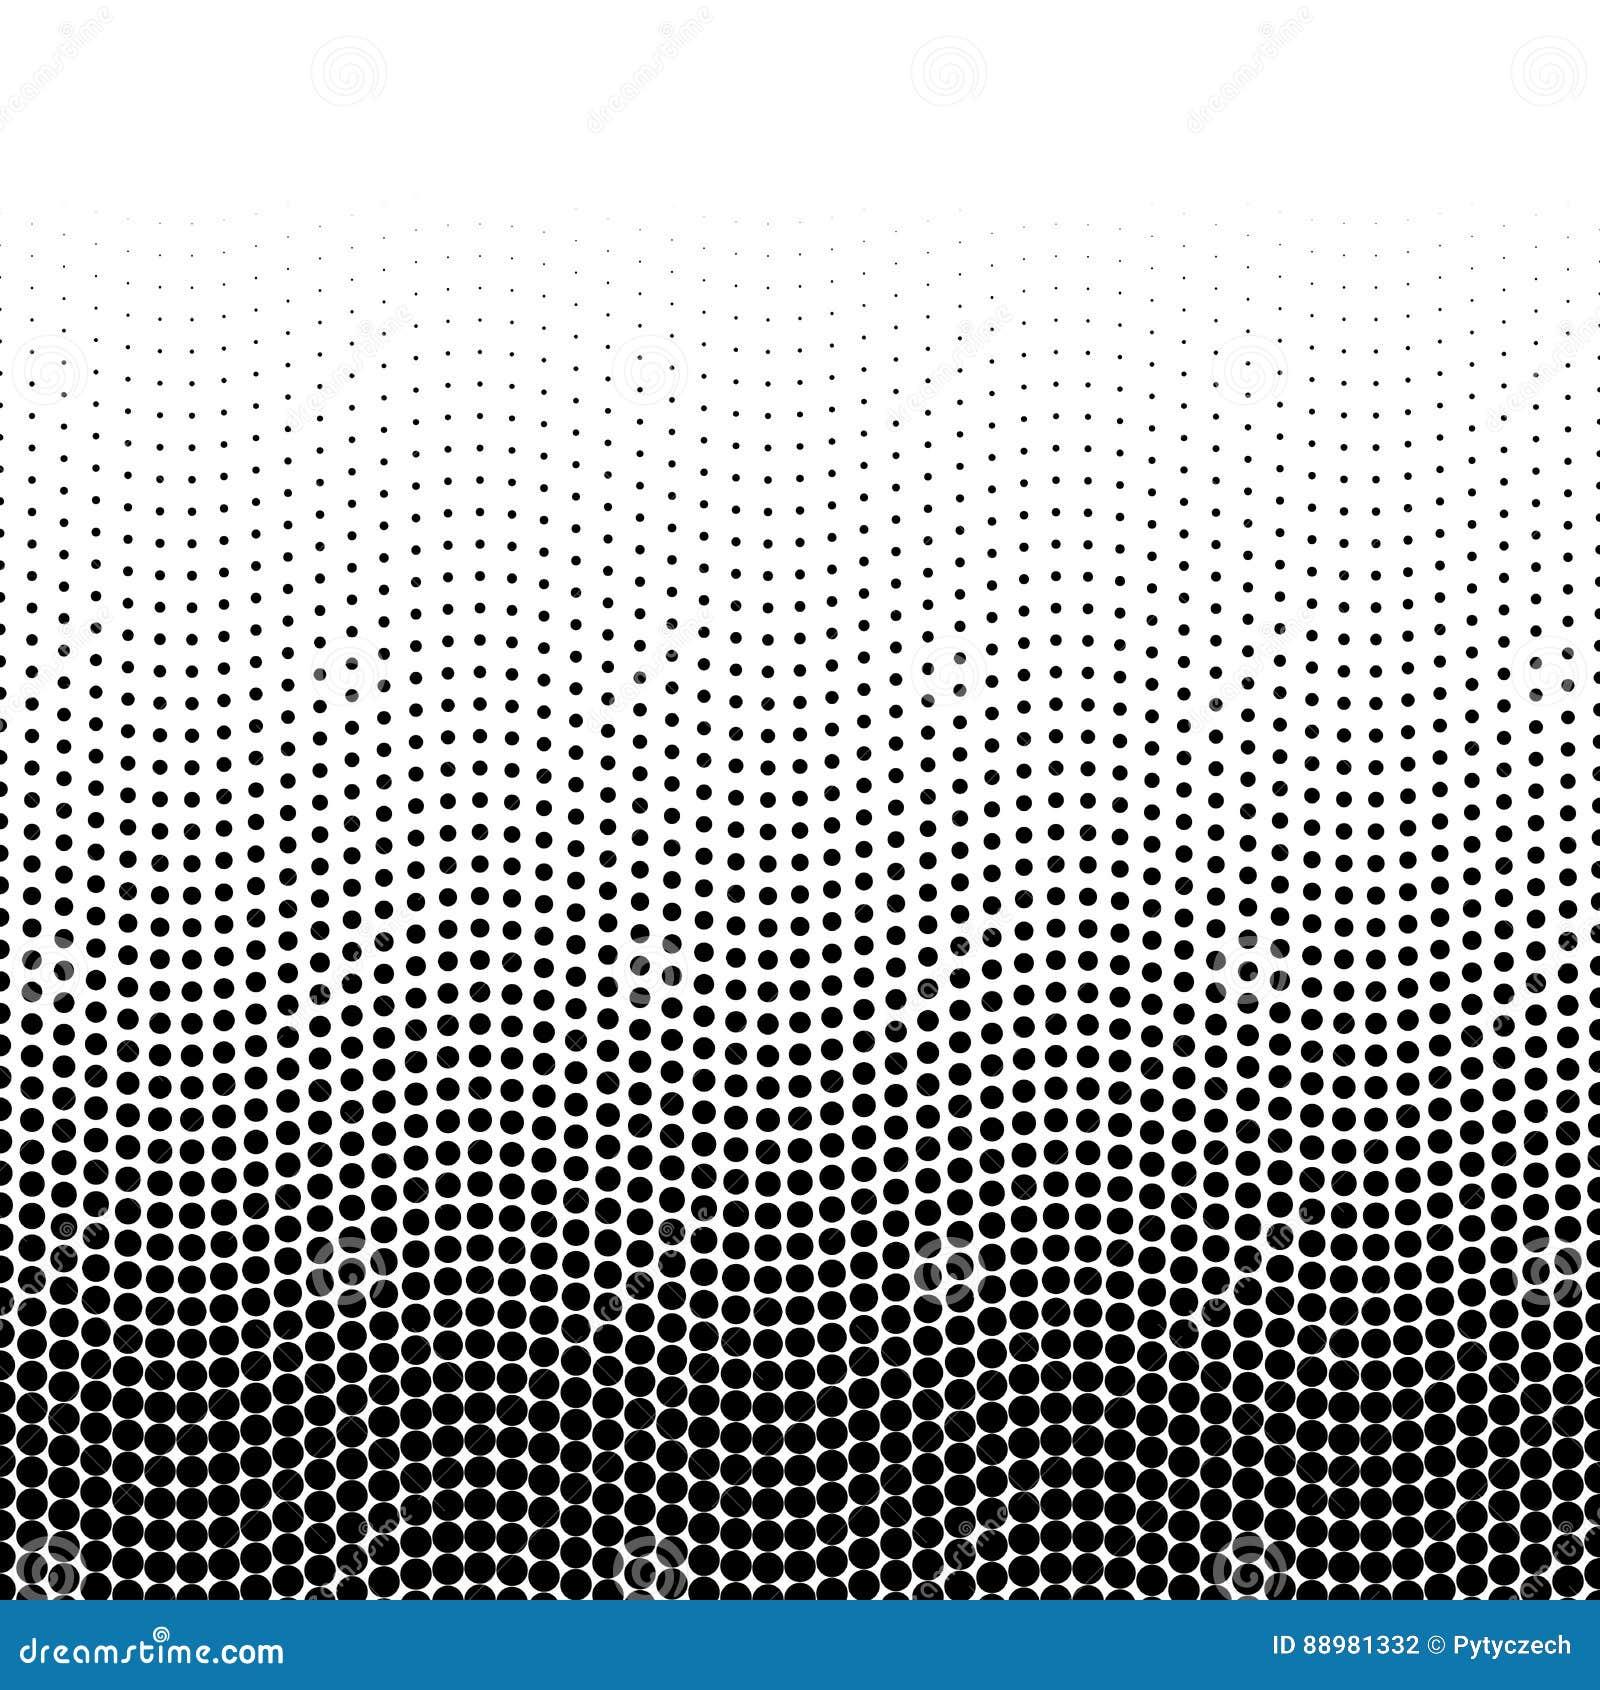 Background image bottom 0 - Halftone Background Of Dots In Wavy Arrangement Black White Bottom Top Gradient